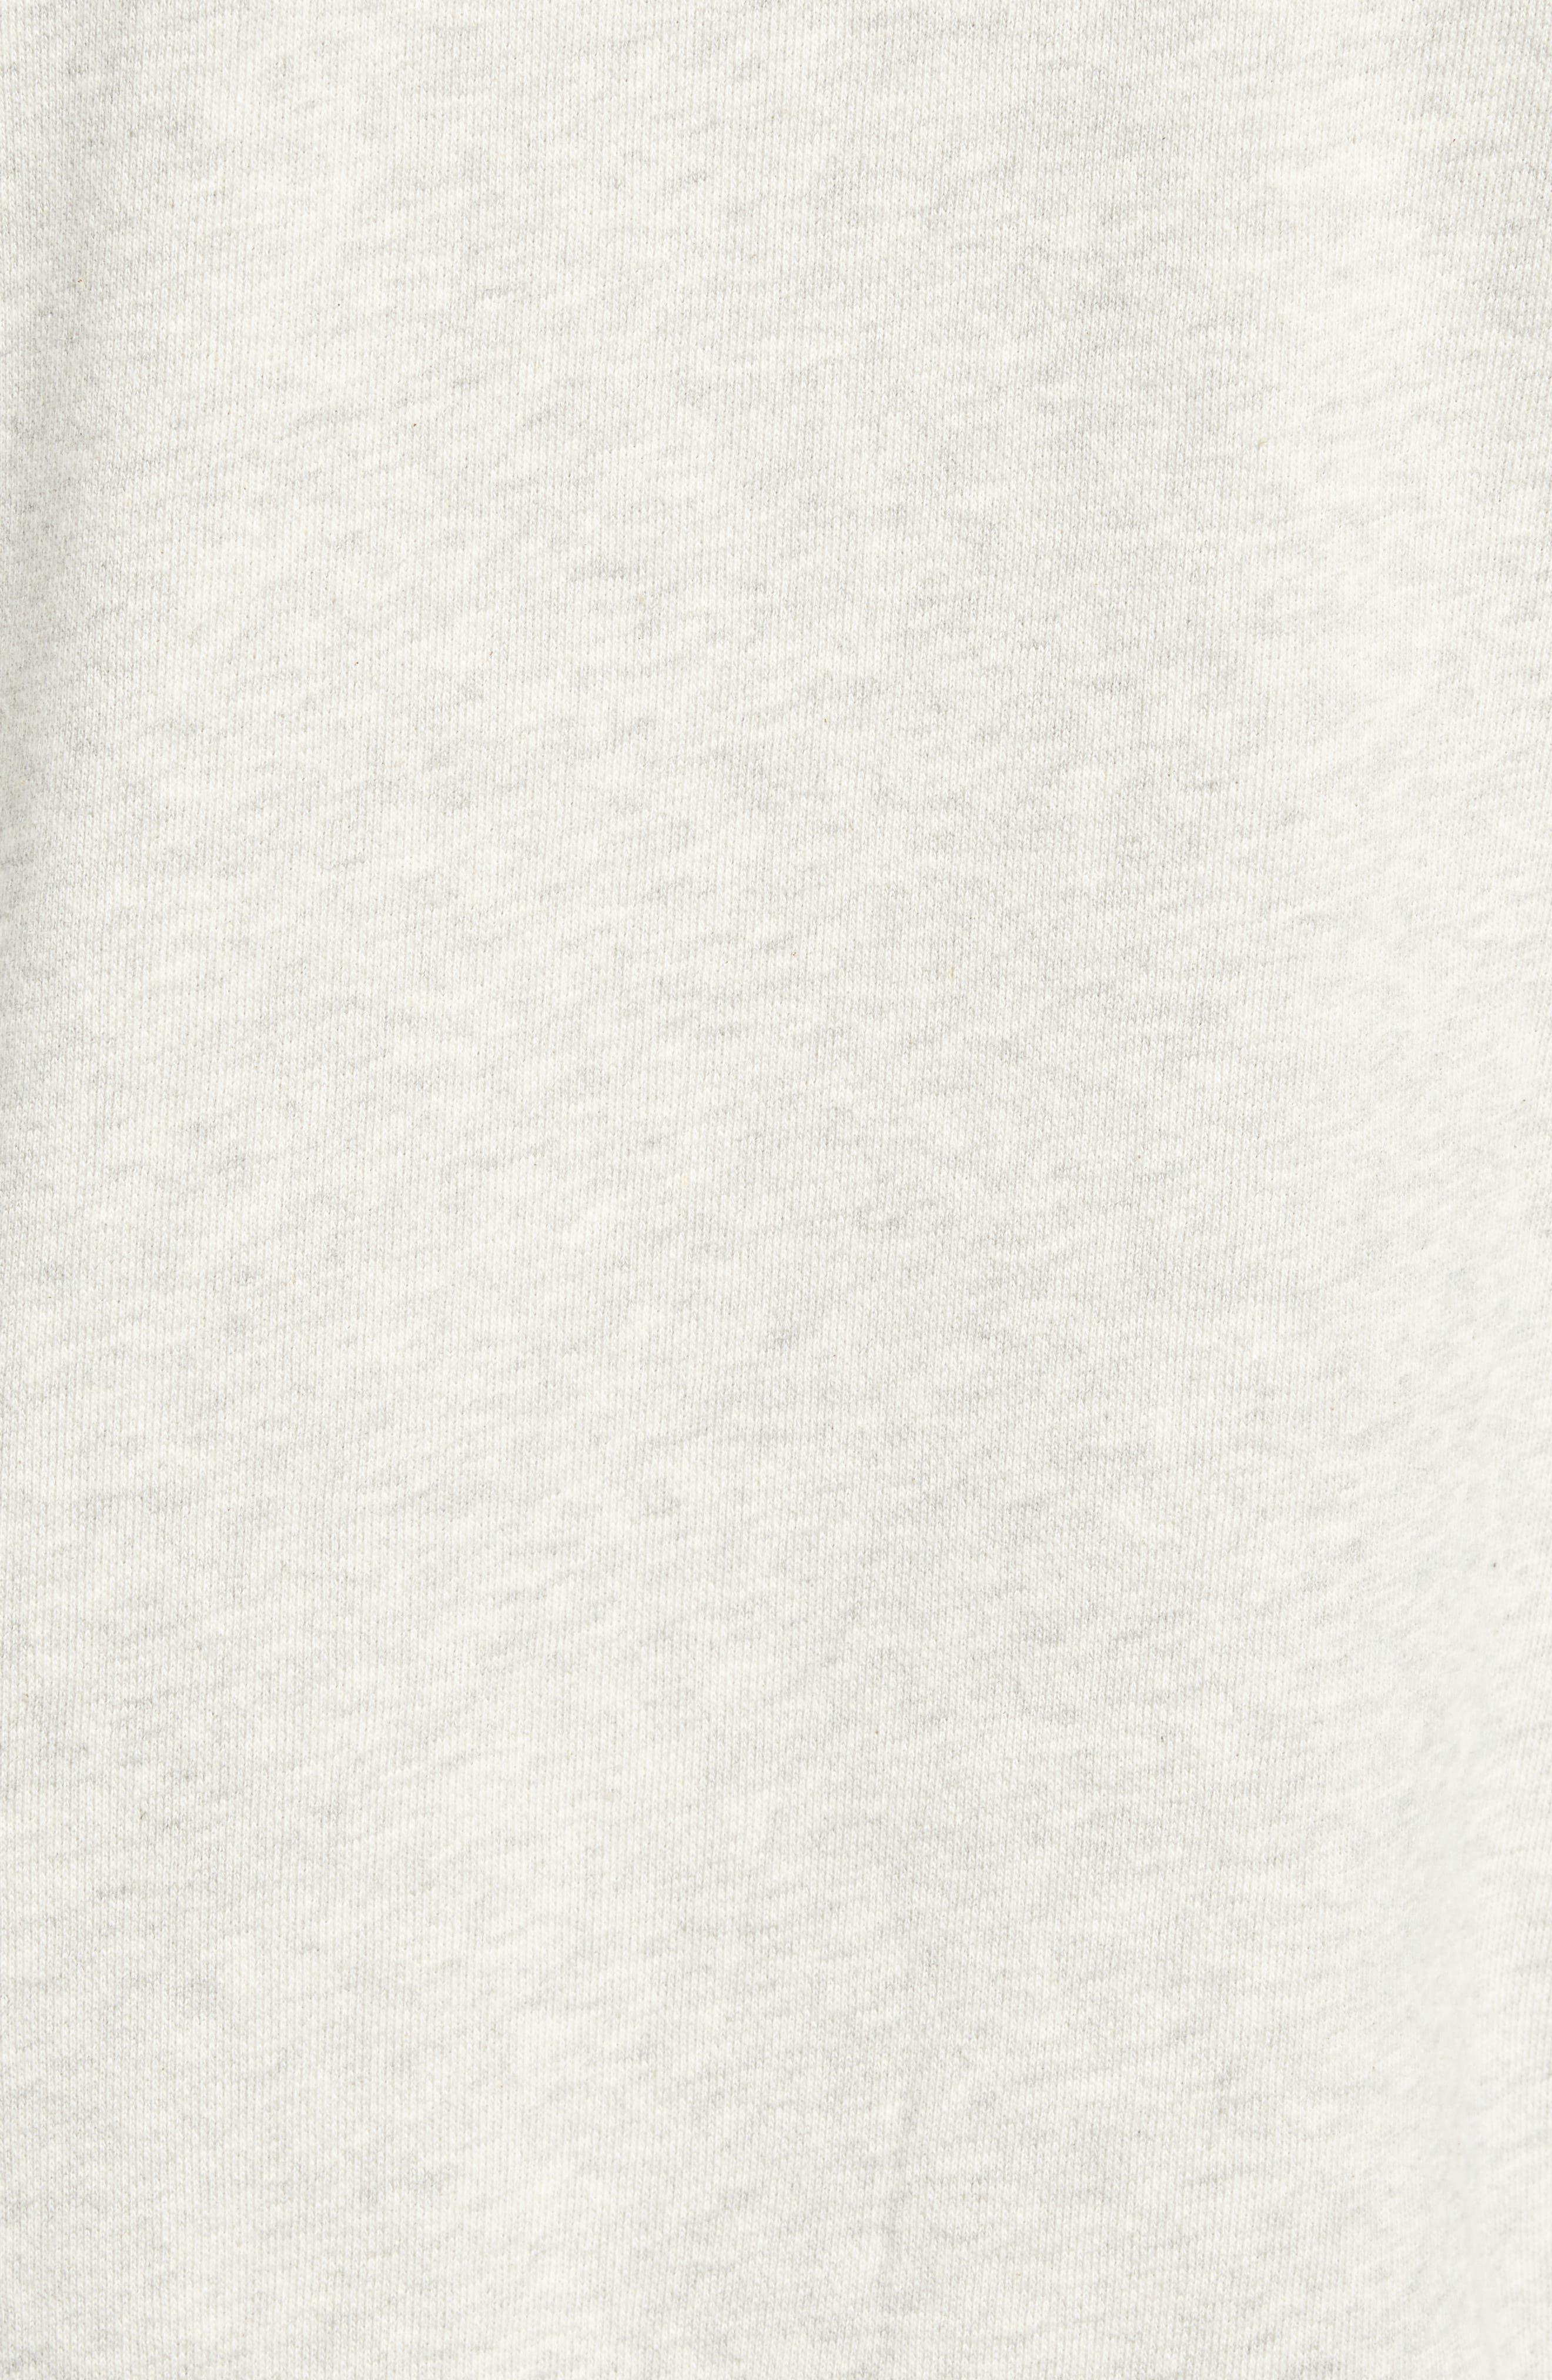 LEVI'S<SUP>®</SUP> VINTAGE CLOTHING, 1930s Bay Meadows Sweatshirt, Alternate thumbnail 5, color, OATMEAL